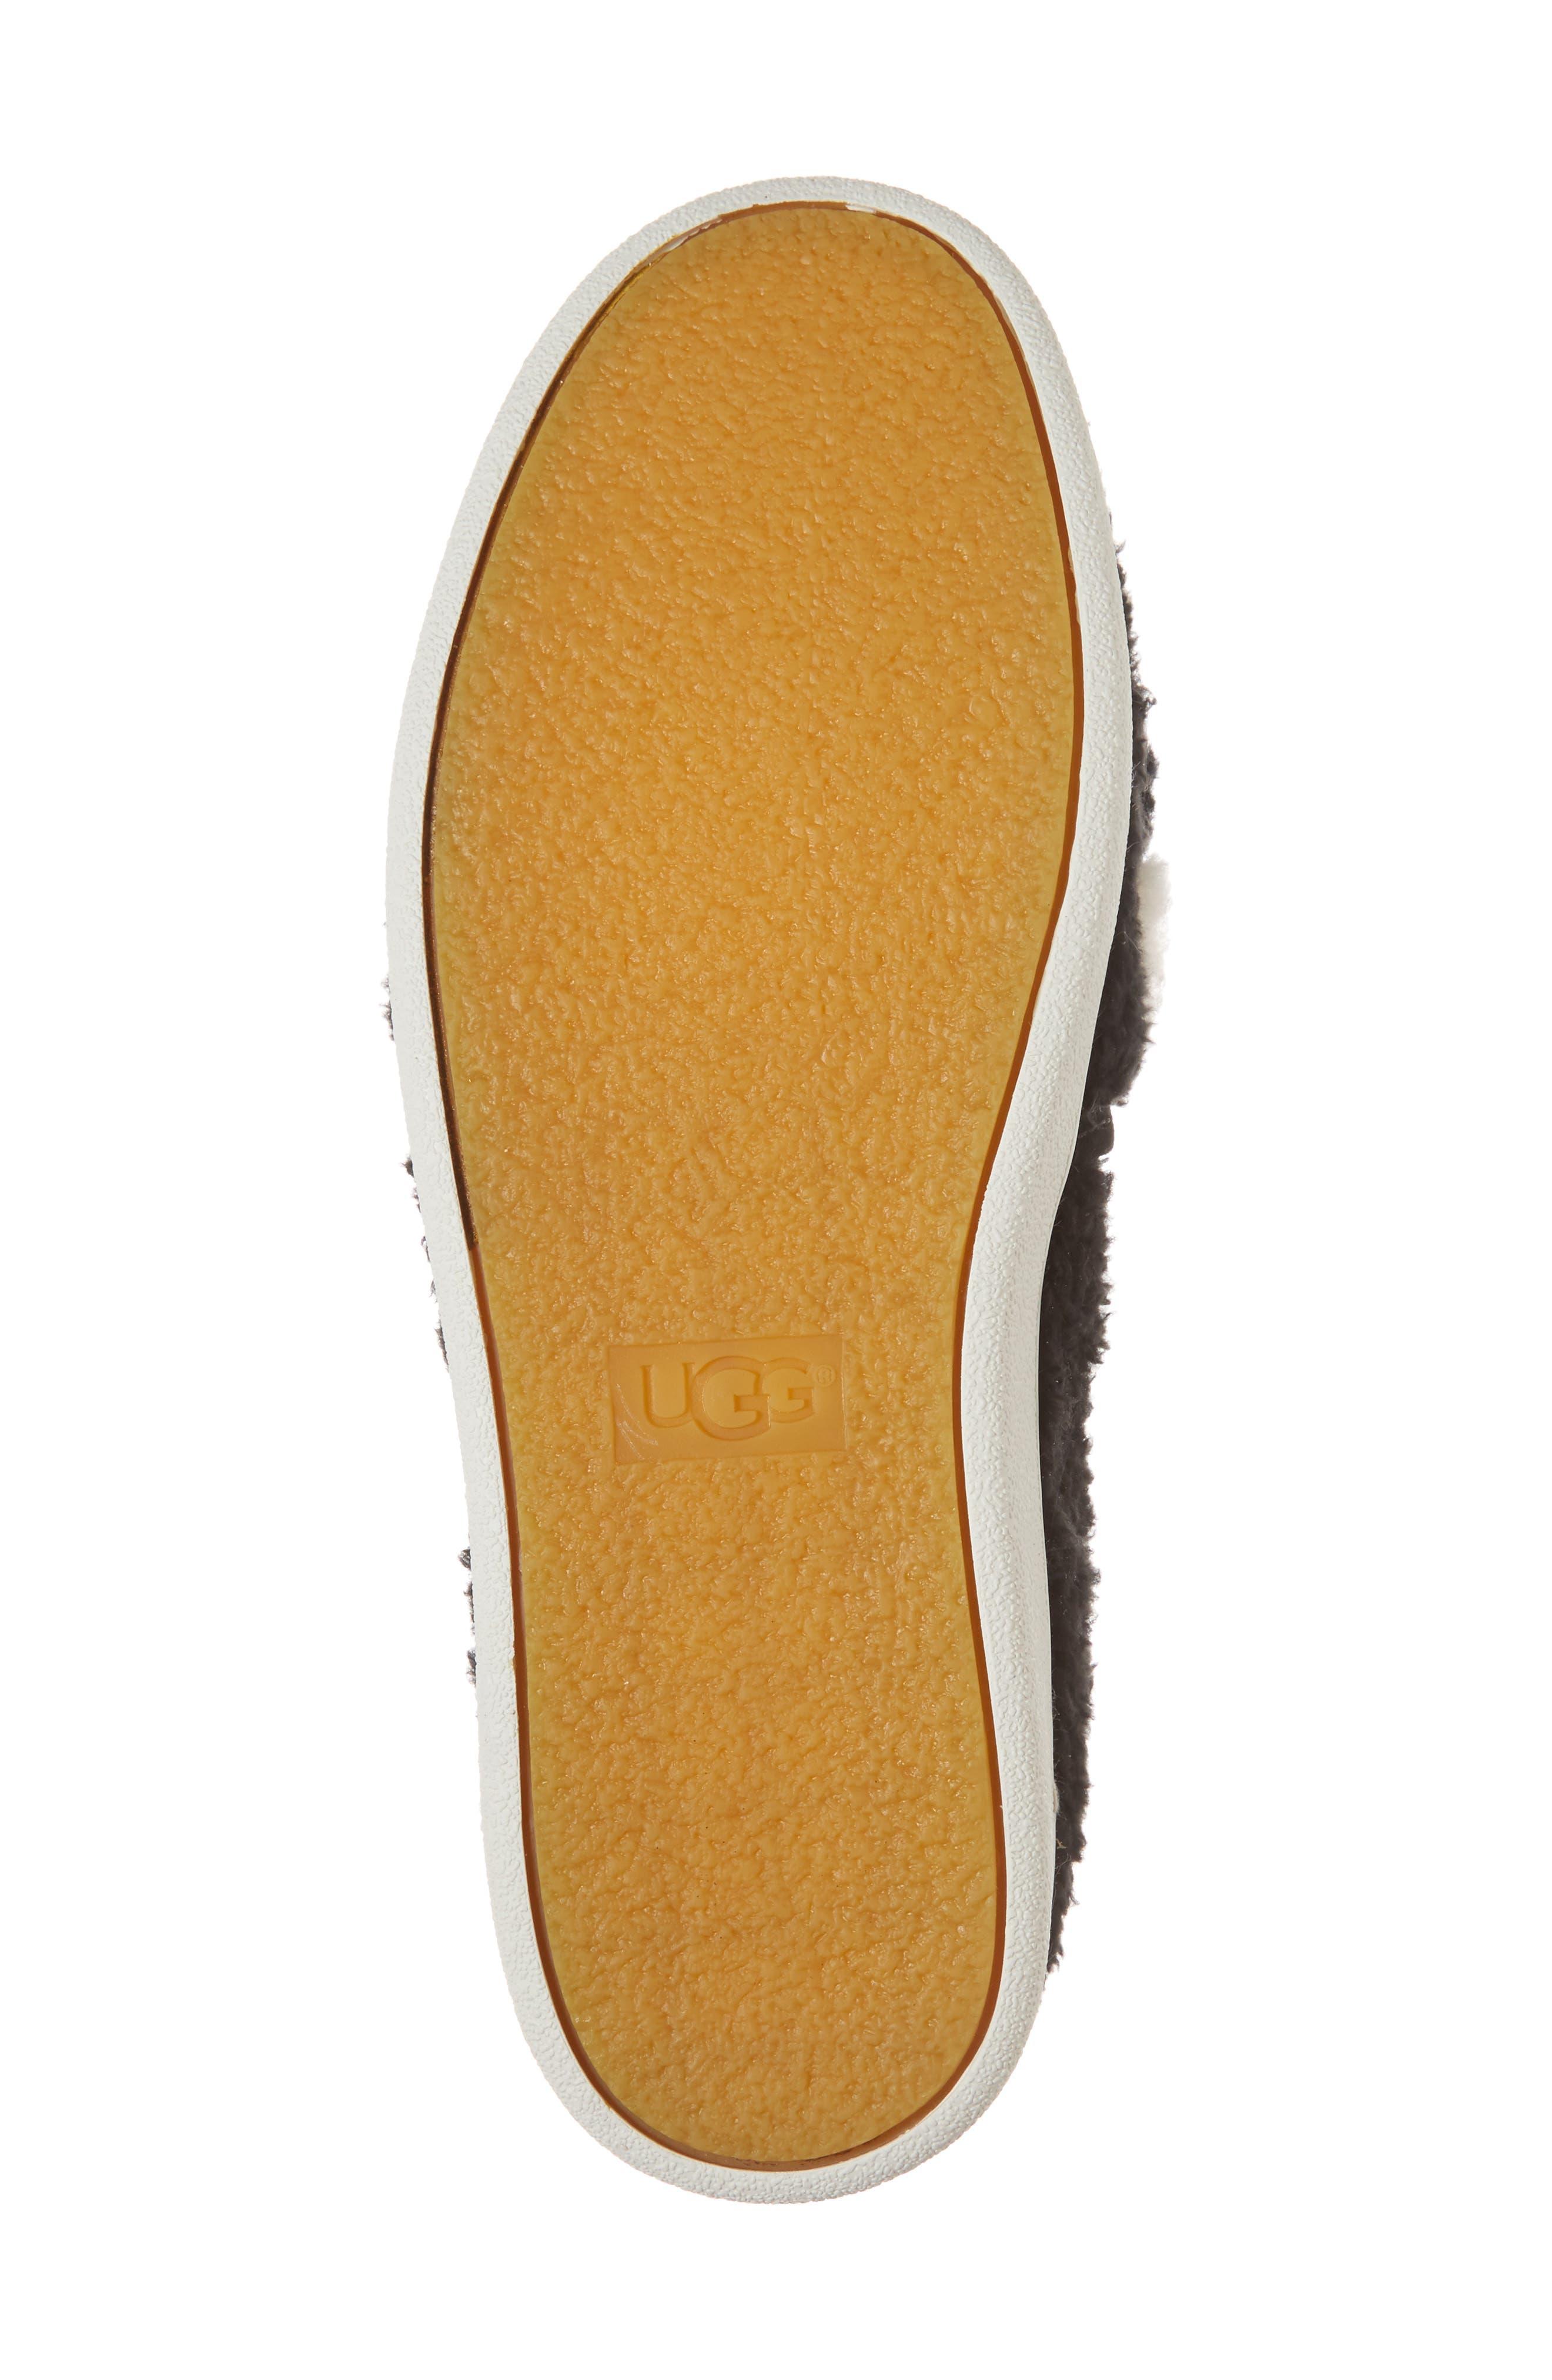 Ricci Plush Genuine Shearling Pompom Slip-On Sneaker,                             Alternate thumbnail 6, color,                             001